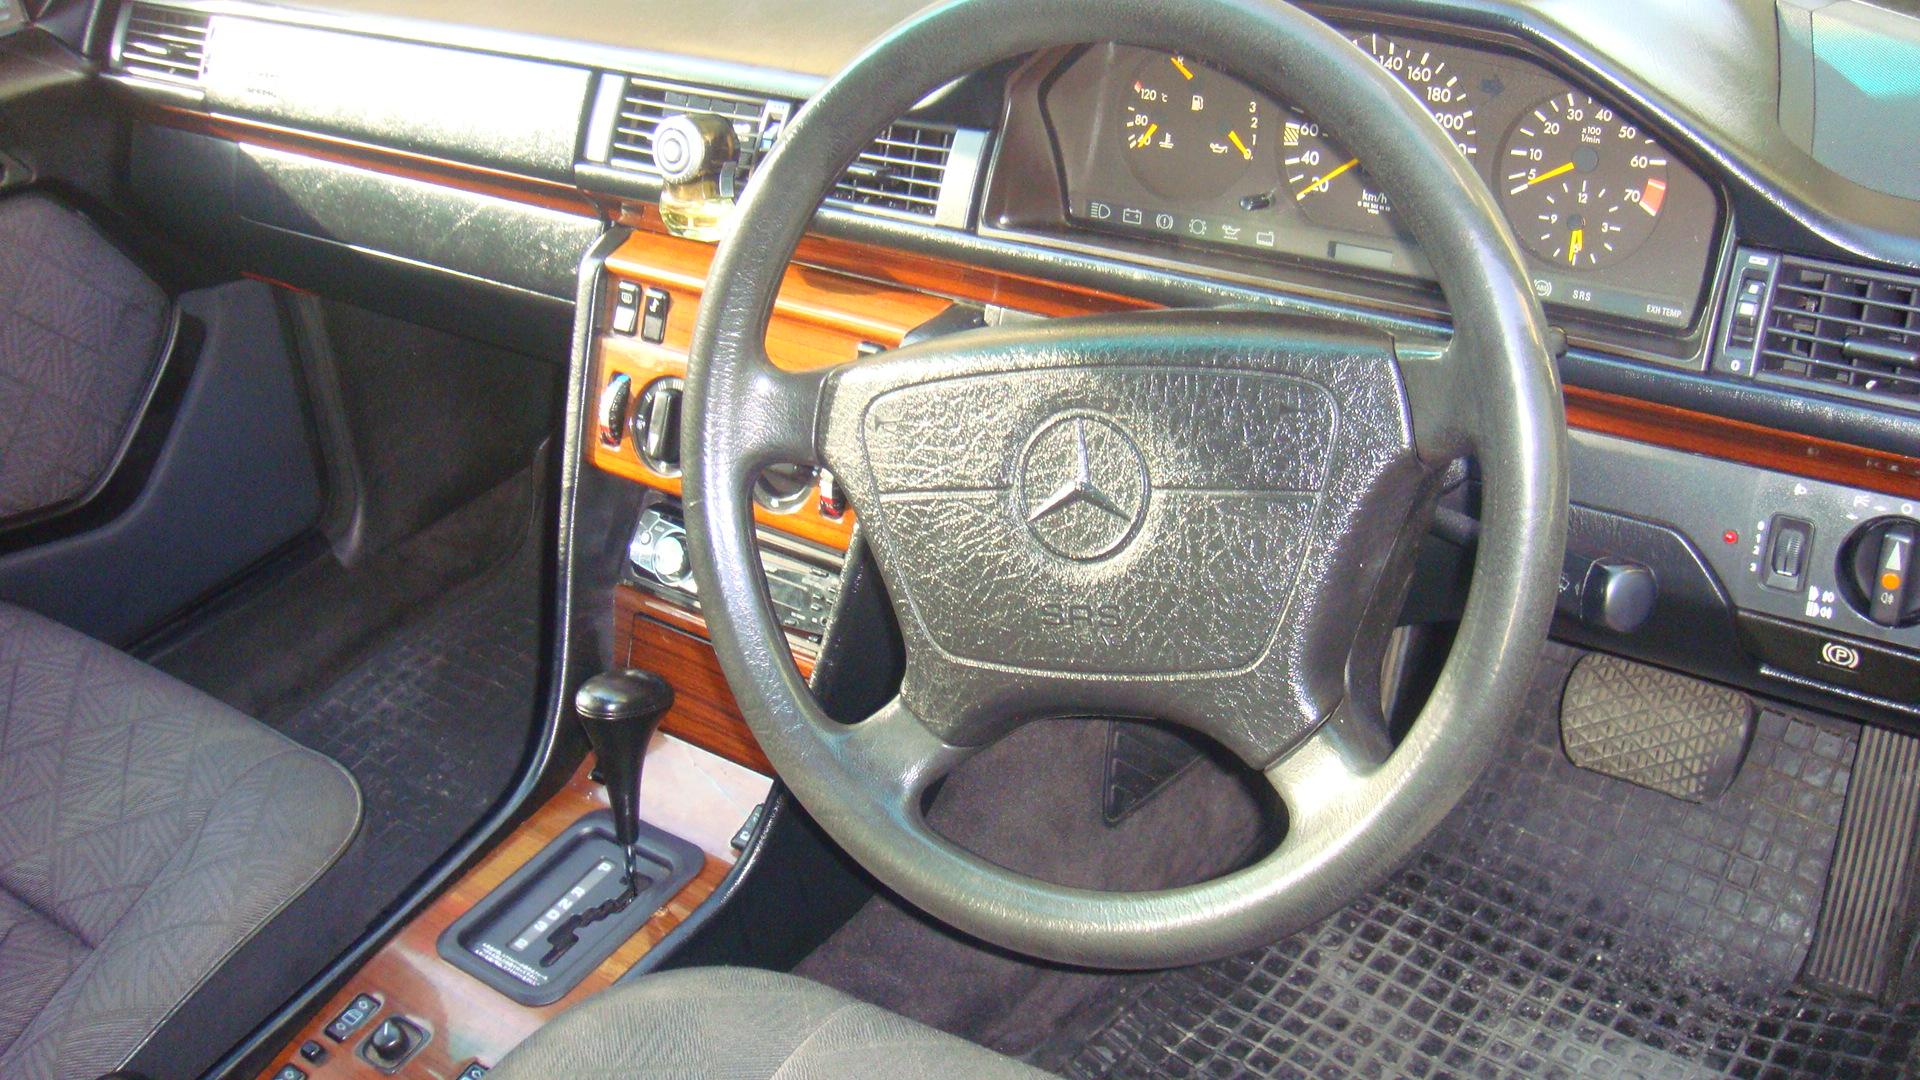 Used Car Parts Online >> Mercedes Benz E Class 1994 of malik1983 - Member Ride 15453 | PakWheels